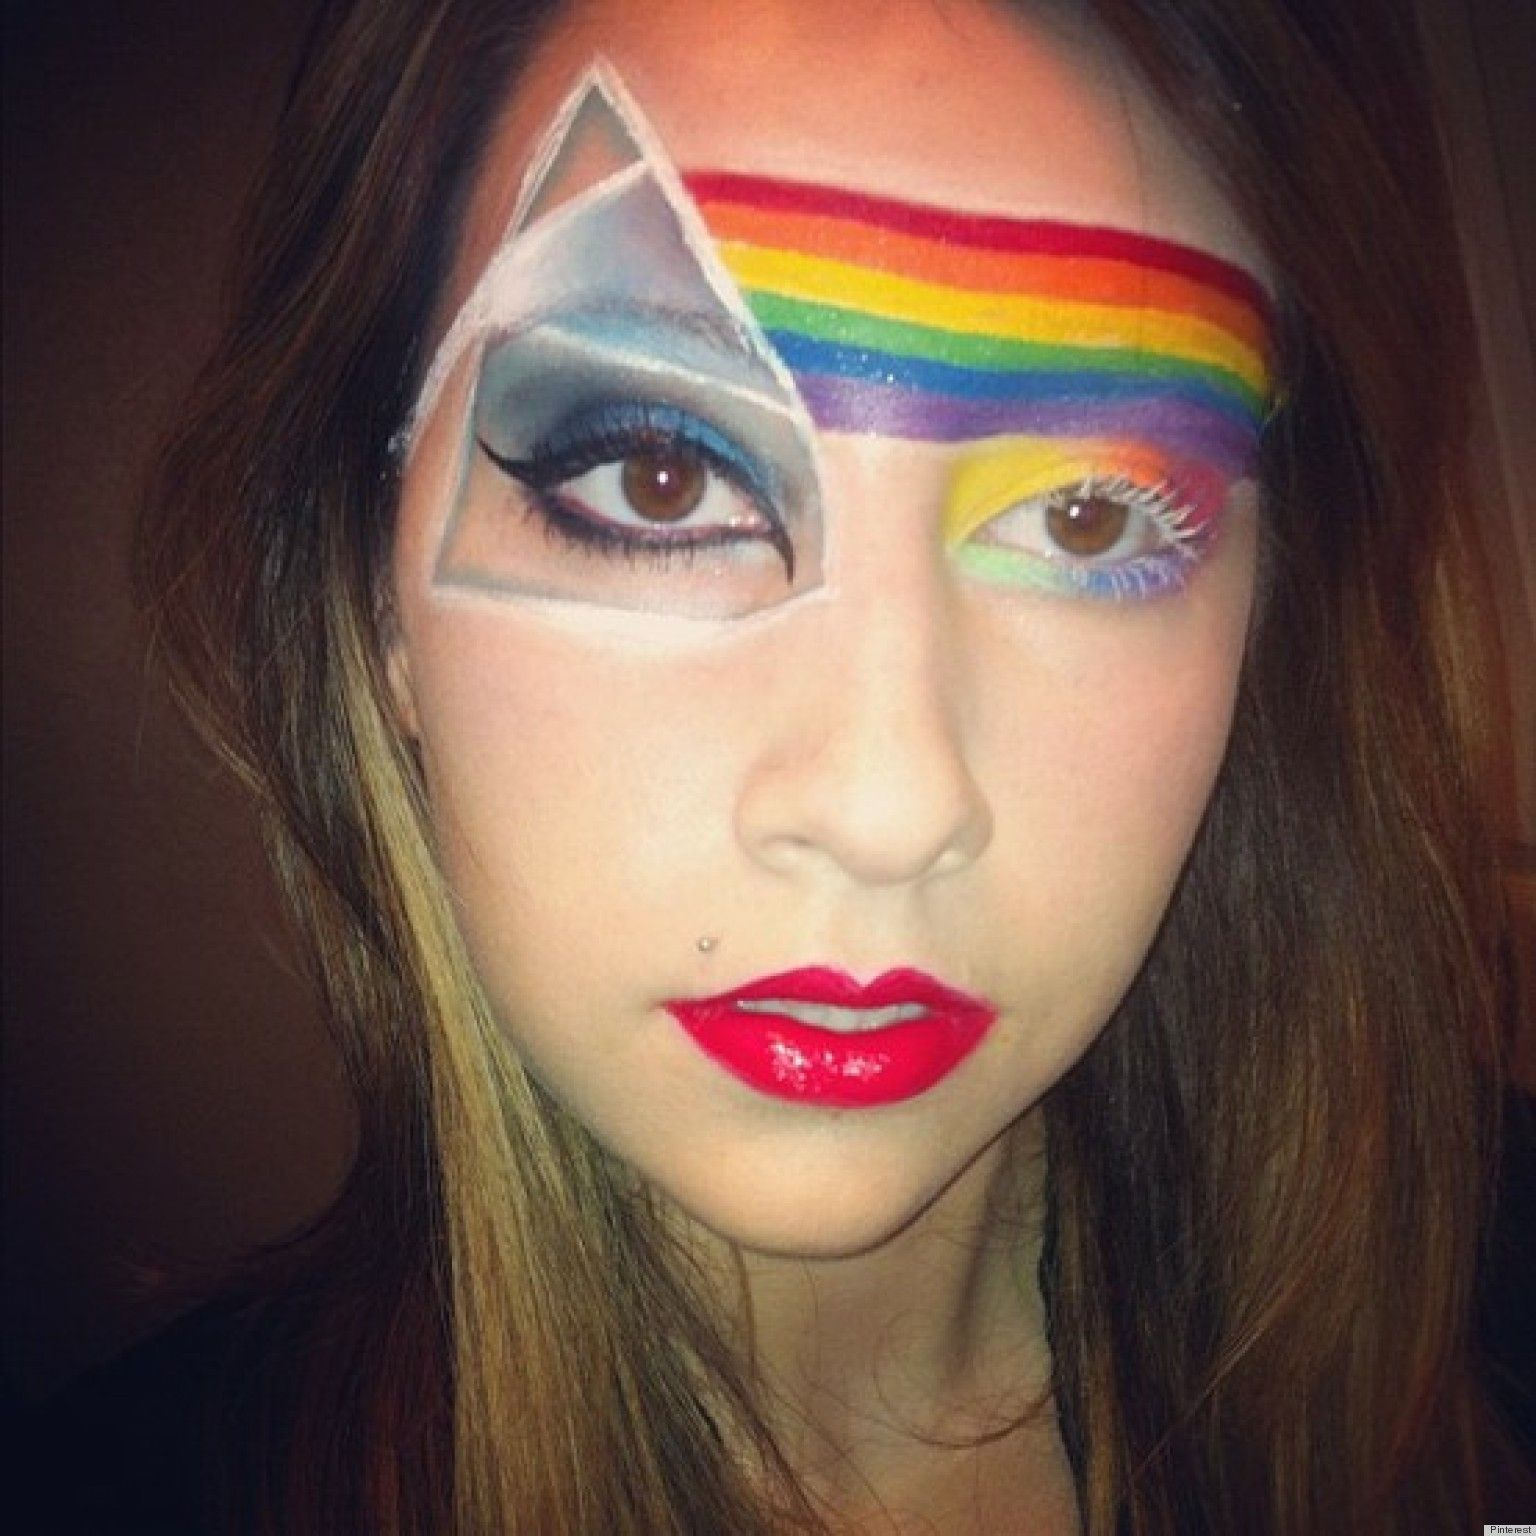 LastMinute Halloween Makeup Ideas From Pinterest (PHOTOS